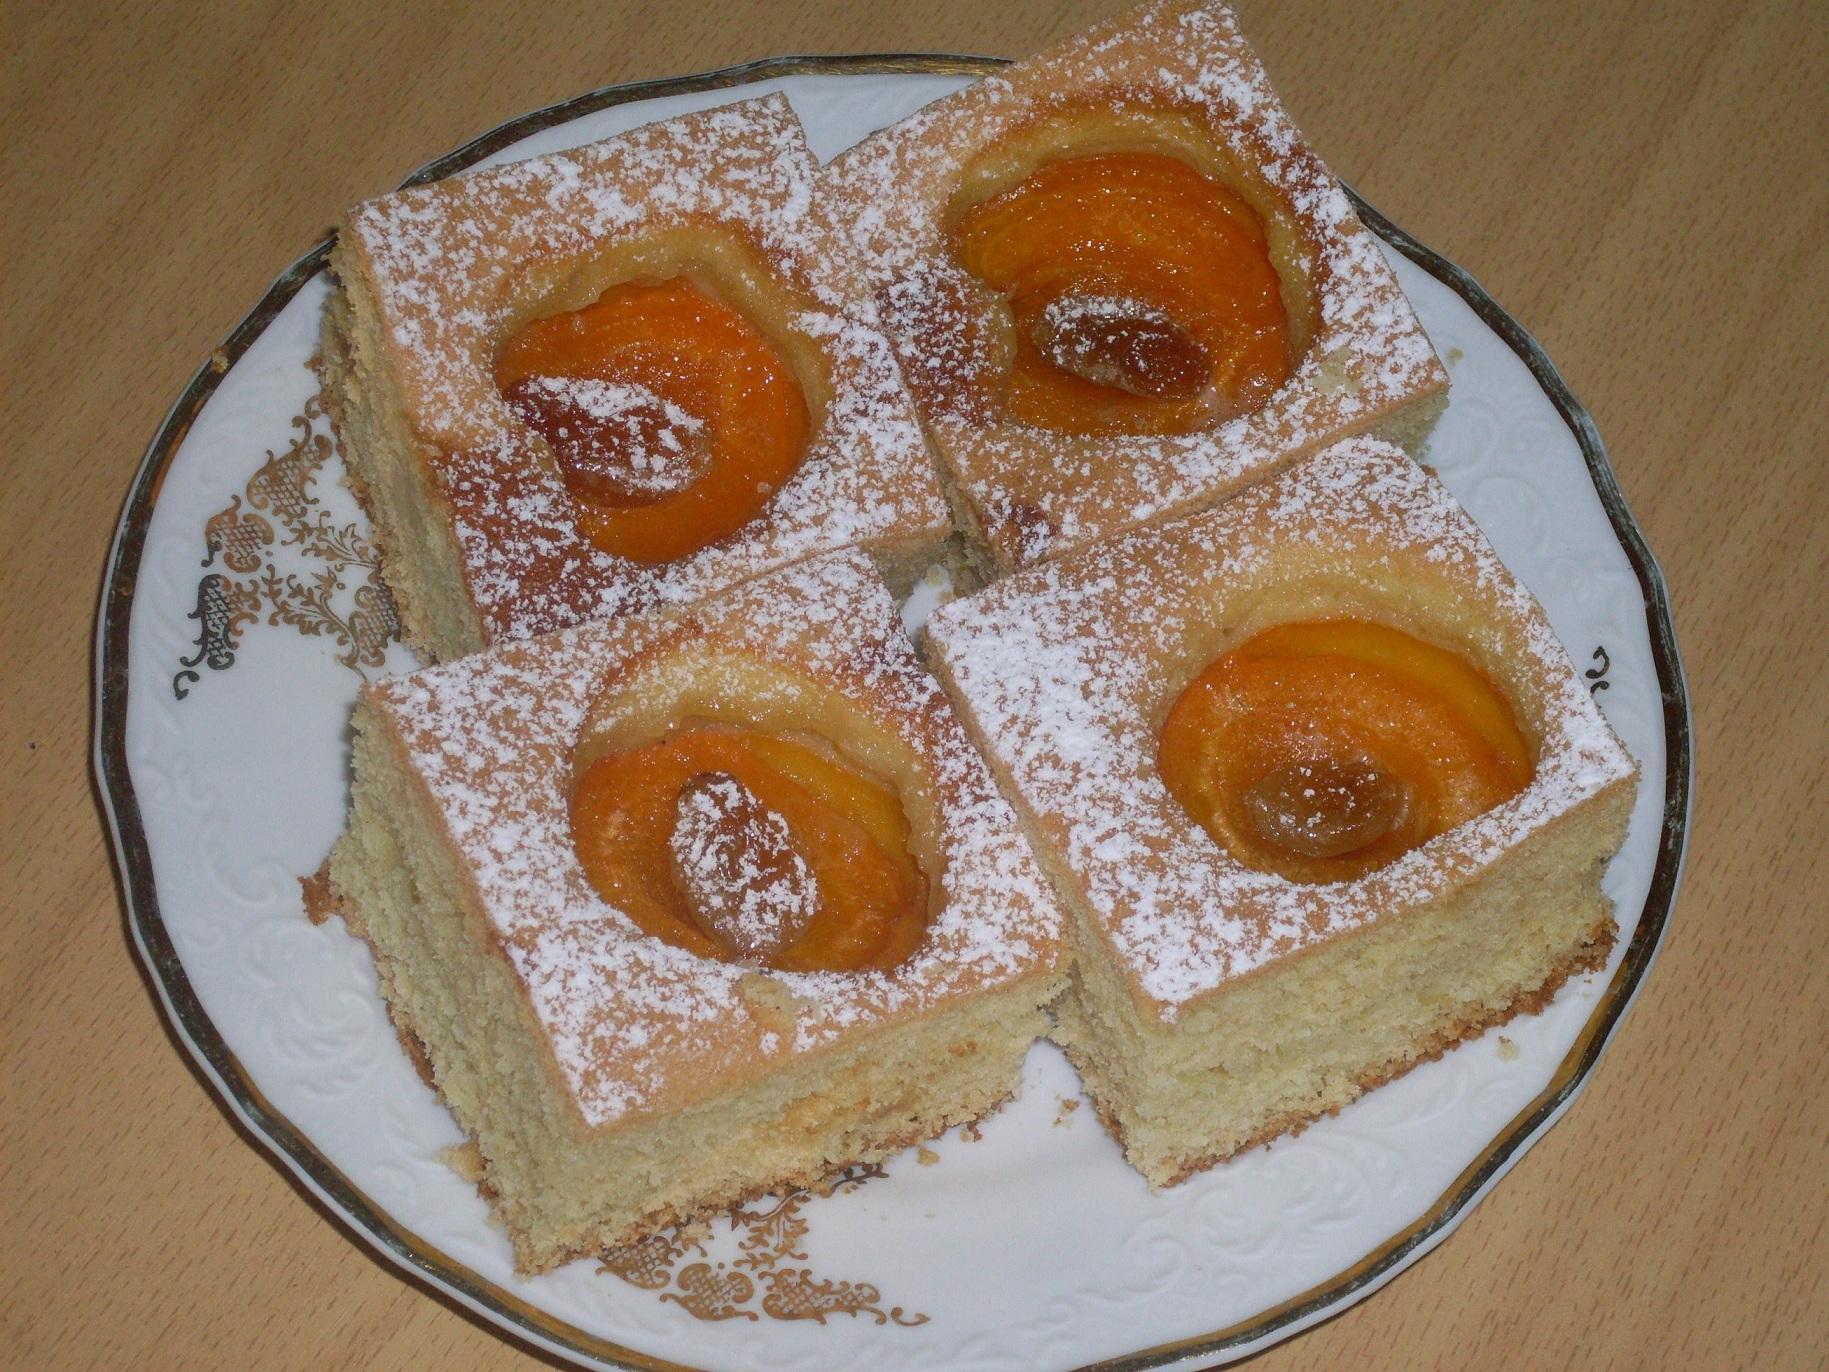 Fotografie receptu: Koláč s meruňkami a medovými rozinkami